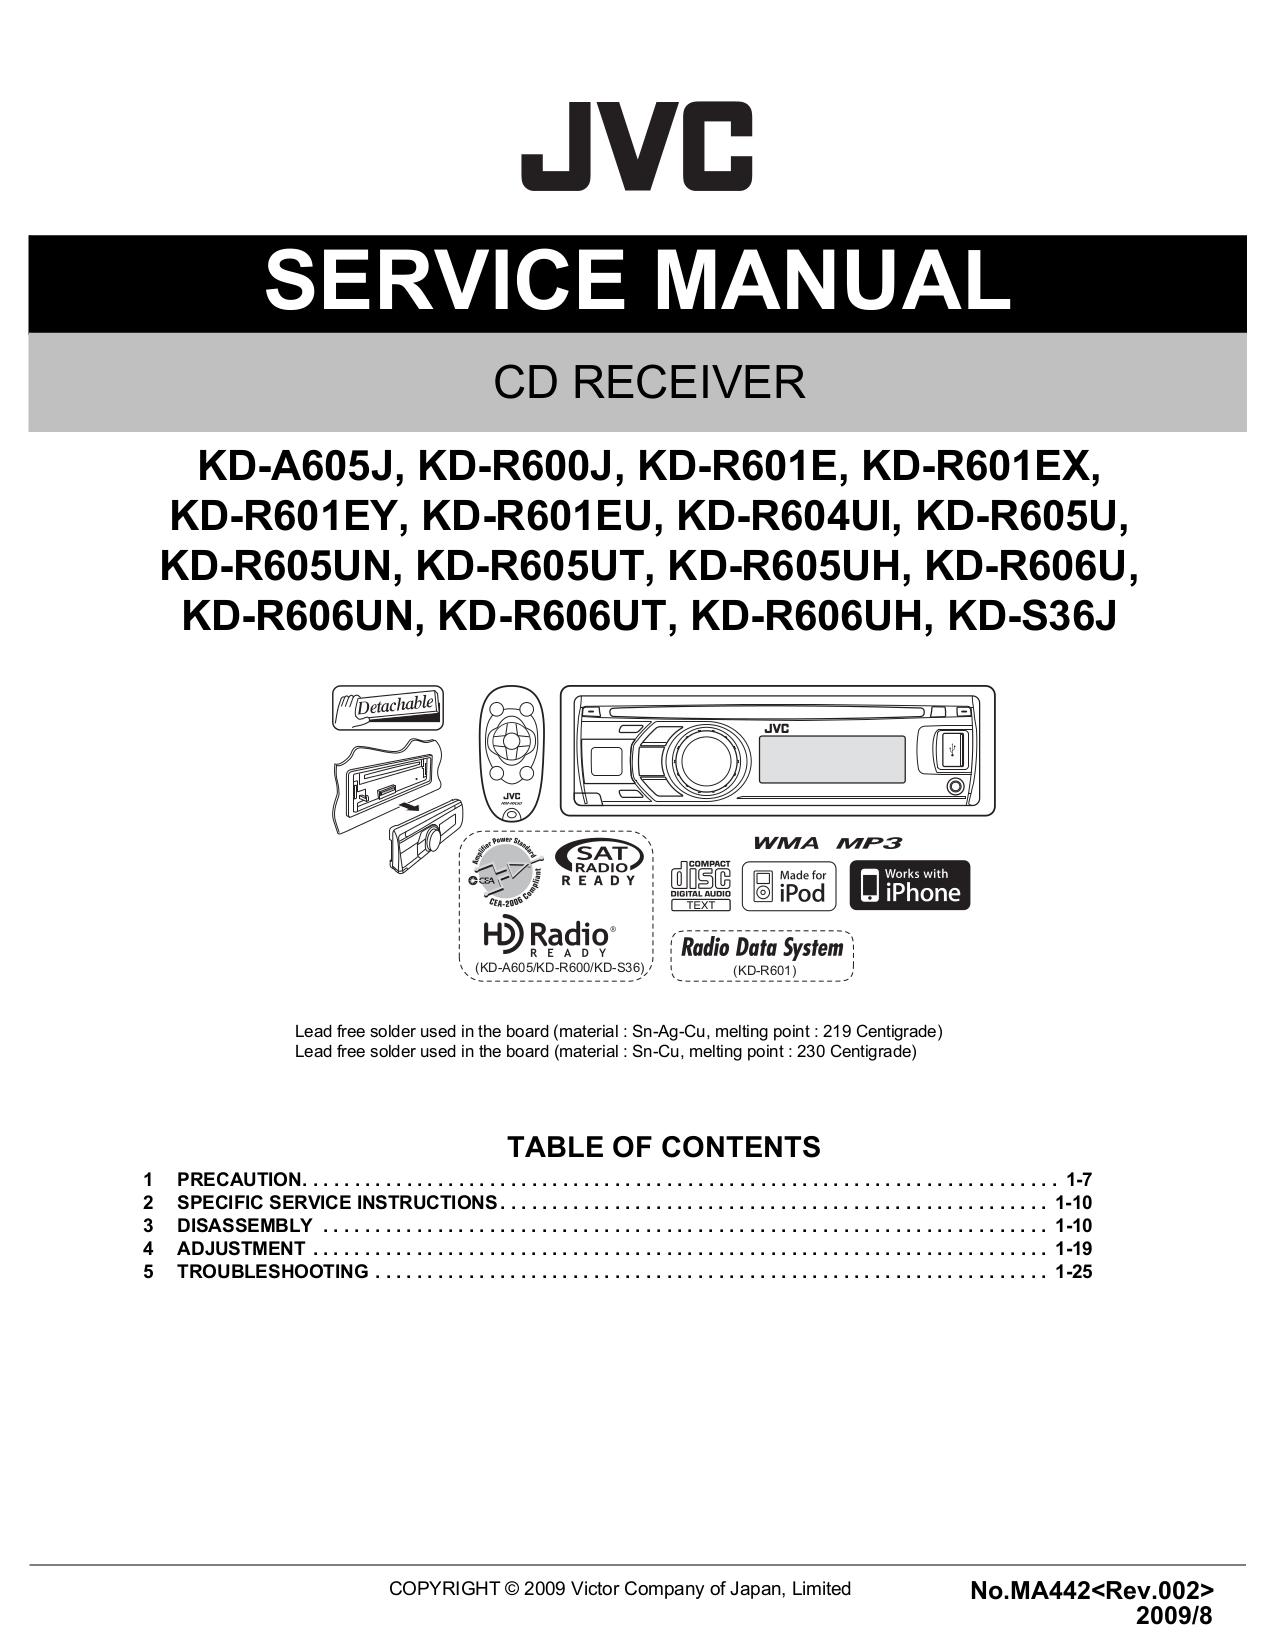 Jvc Kd-s29 Wiring Diagram on